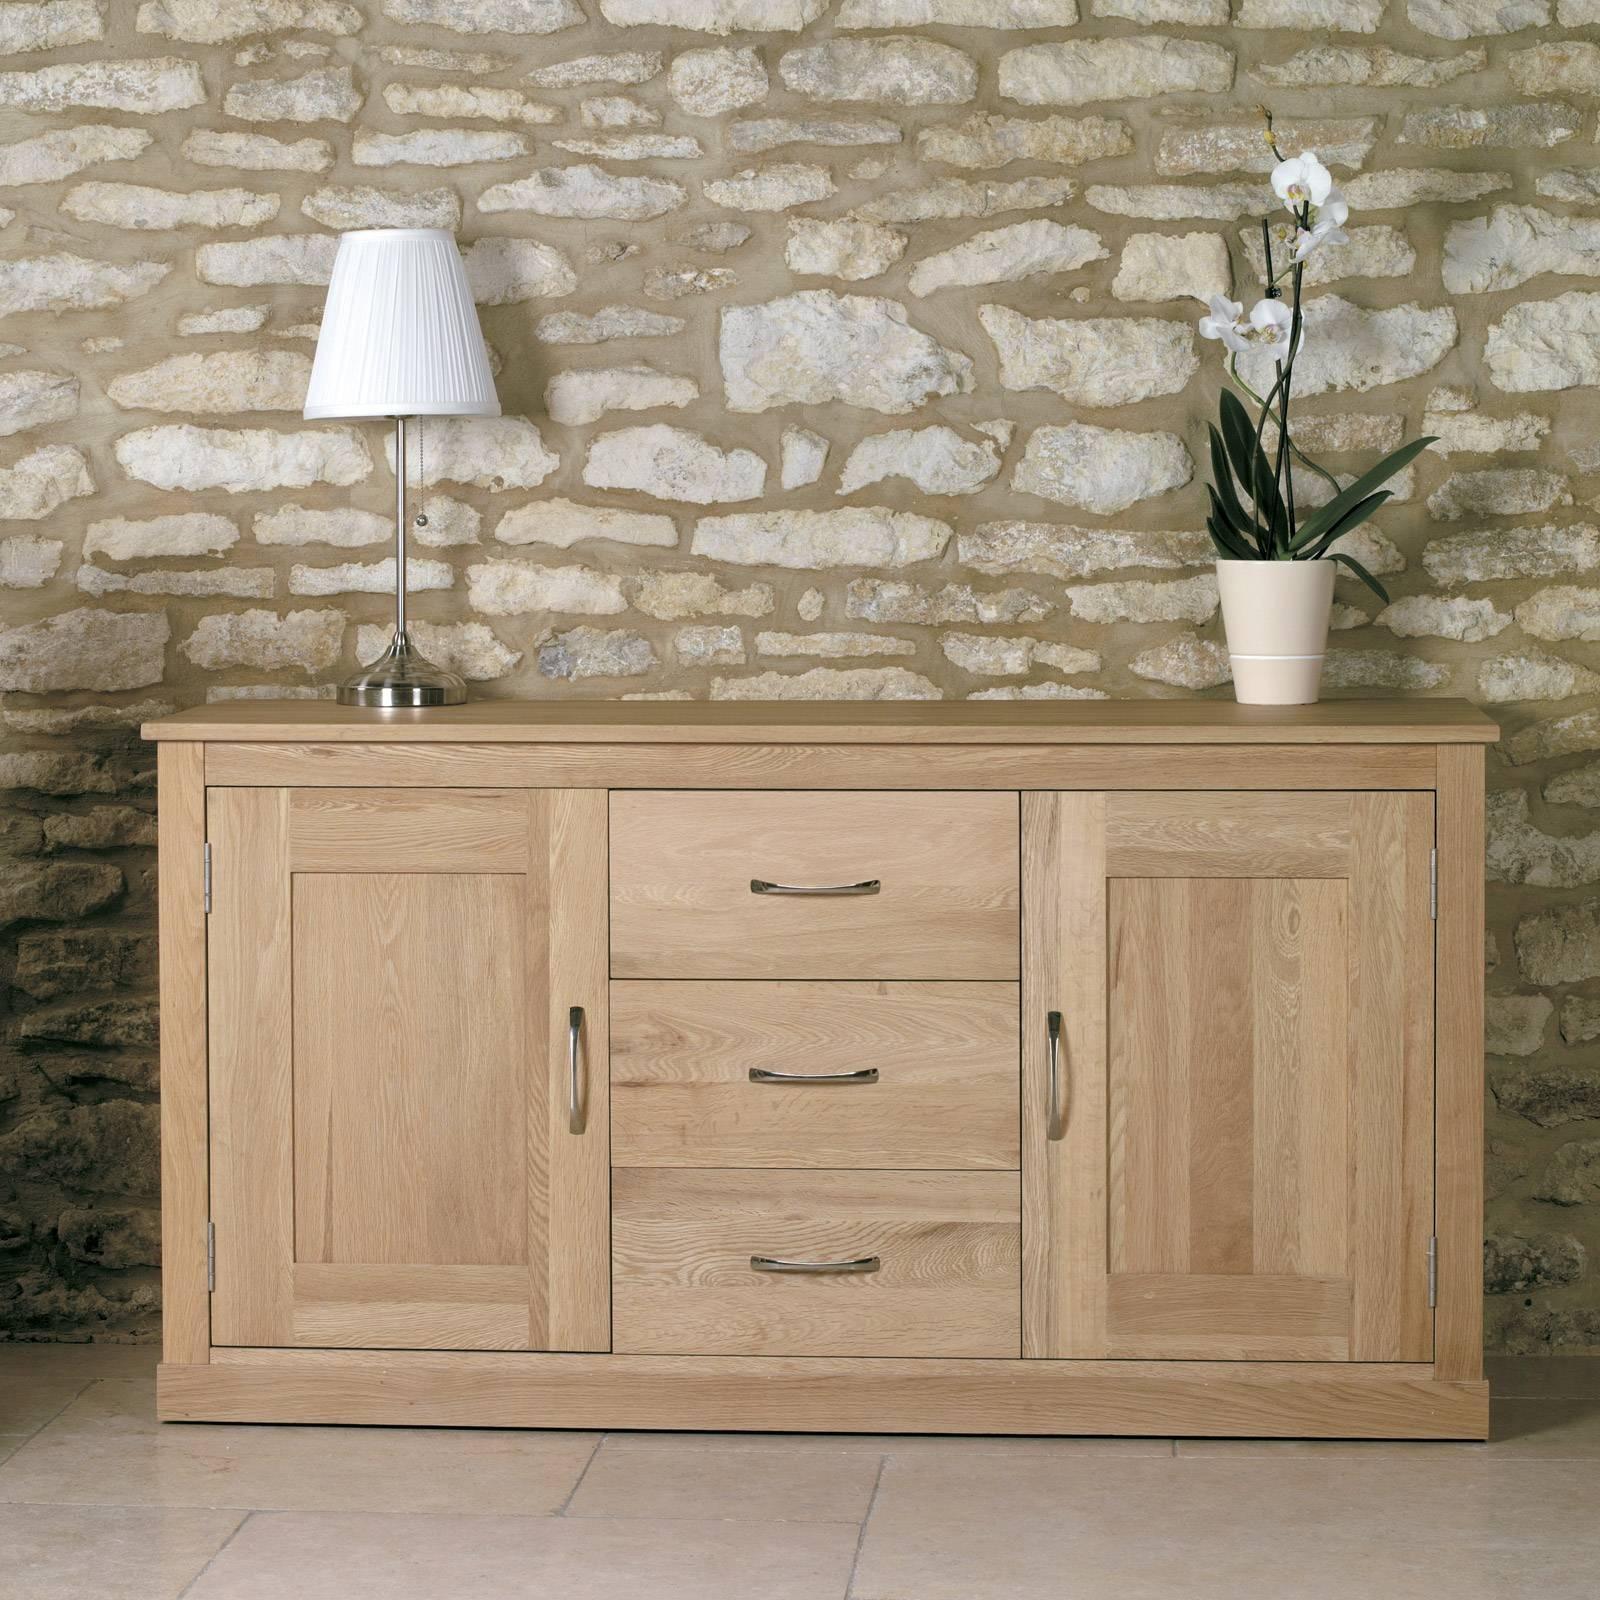 Large Oak Sideboard – Range Furniture With Regard To Most Recent Large Oak Sideboard (View 8 of 15)